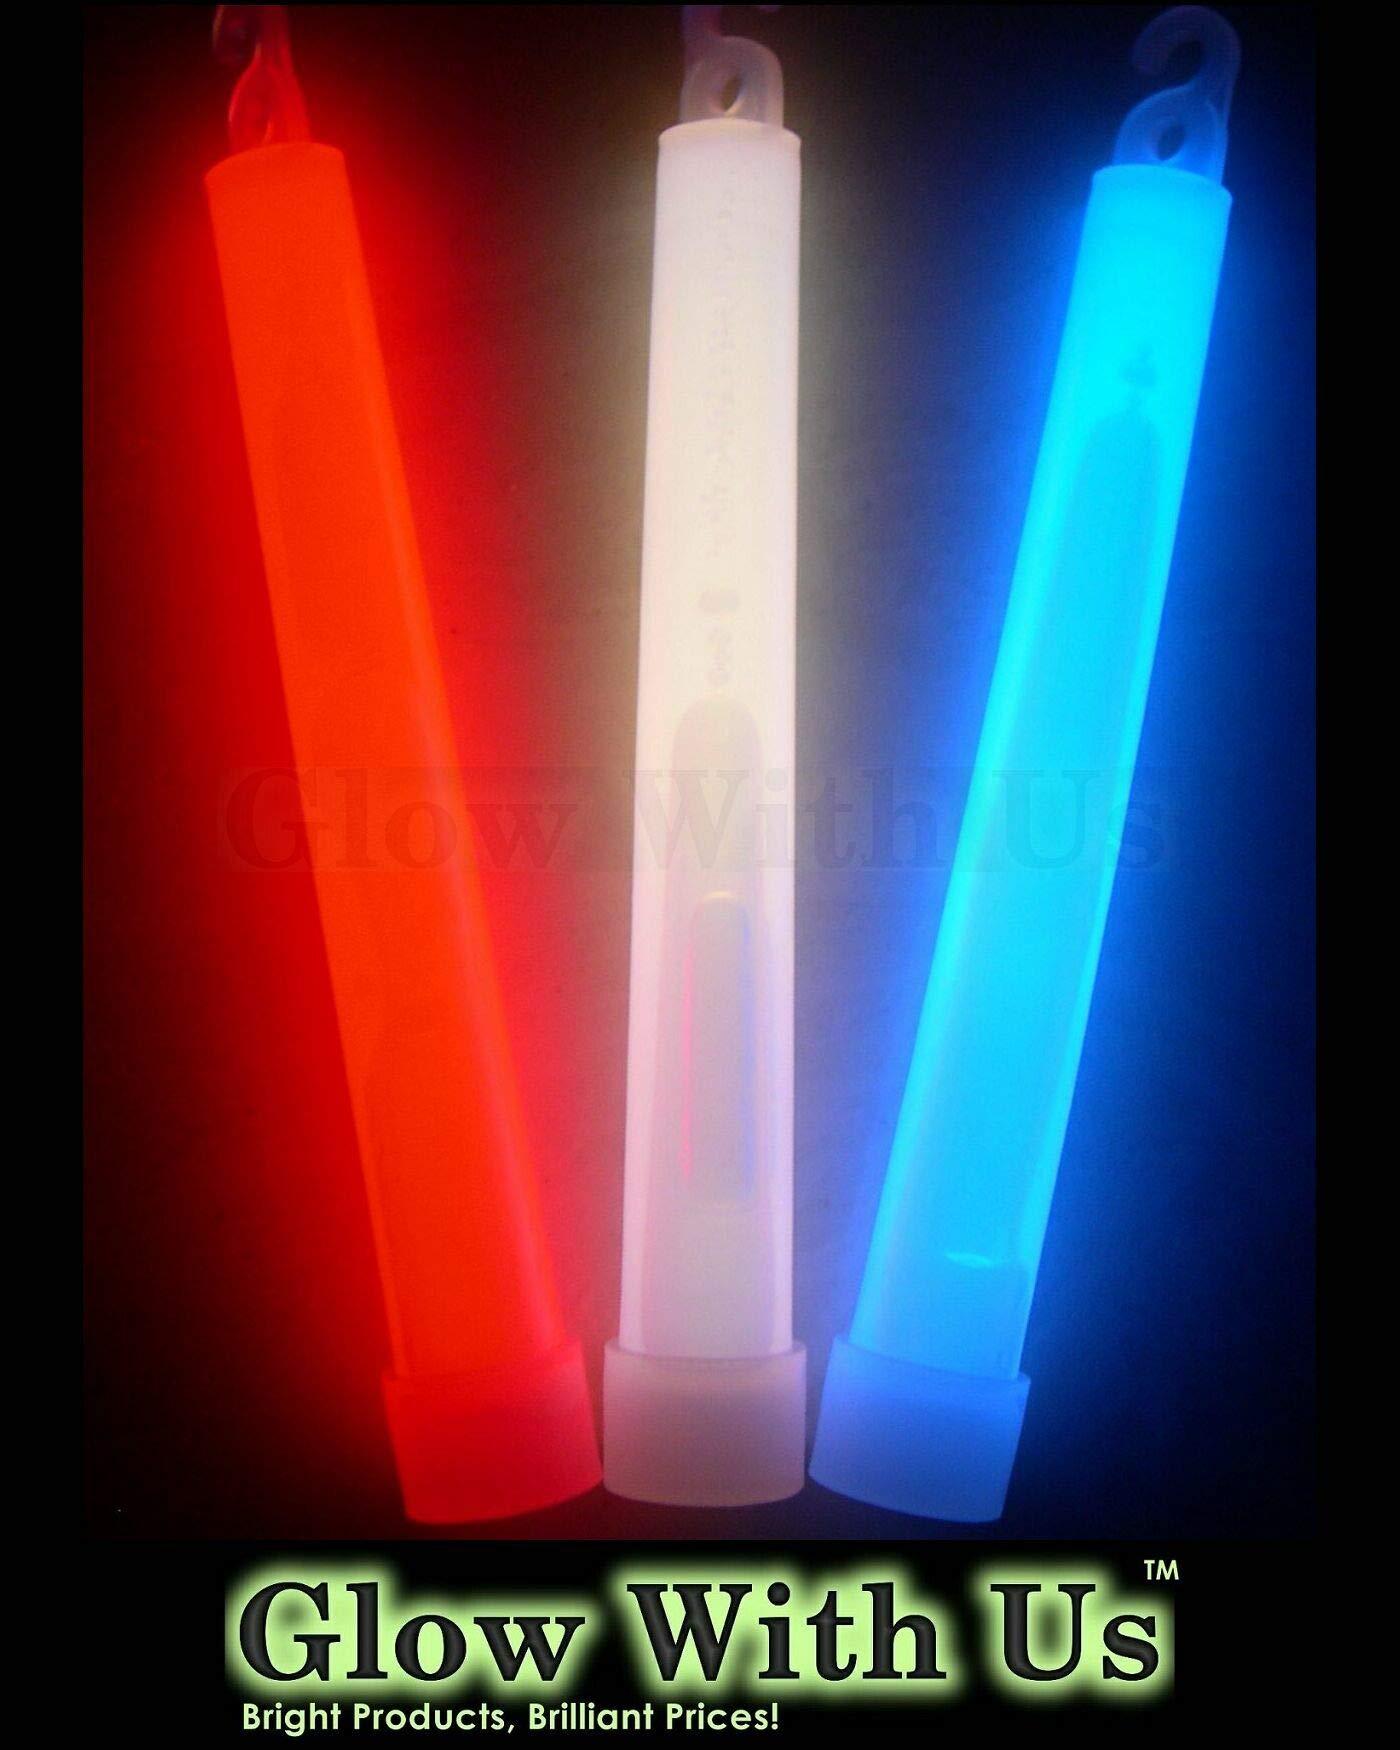 "Glow Sticks Bulk Wholesale, 75 6"" Industrial Grade Light Sticks, Bright Red/White/Blue Patriotic Colors, Glow 12-14 Hrs, Glow Stick with 3-Year Shelf Life, GlowWithUs Brand"